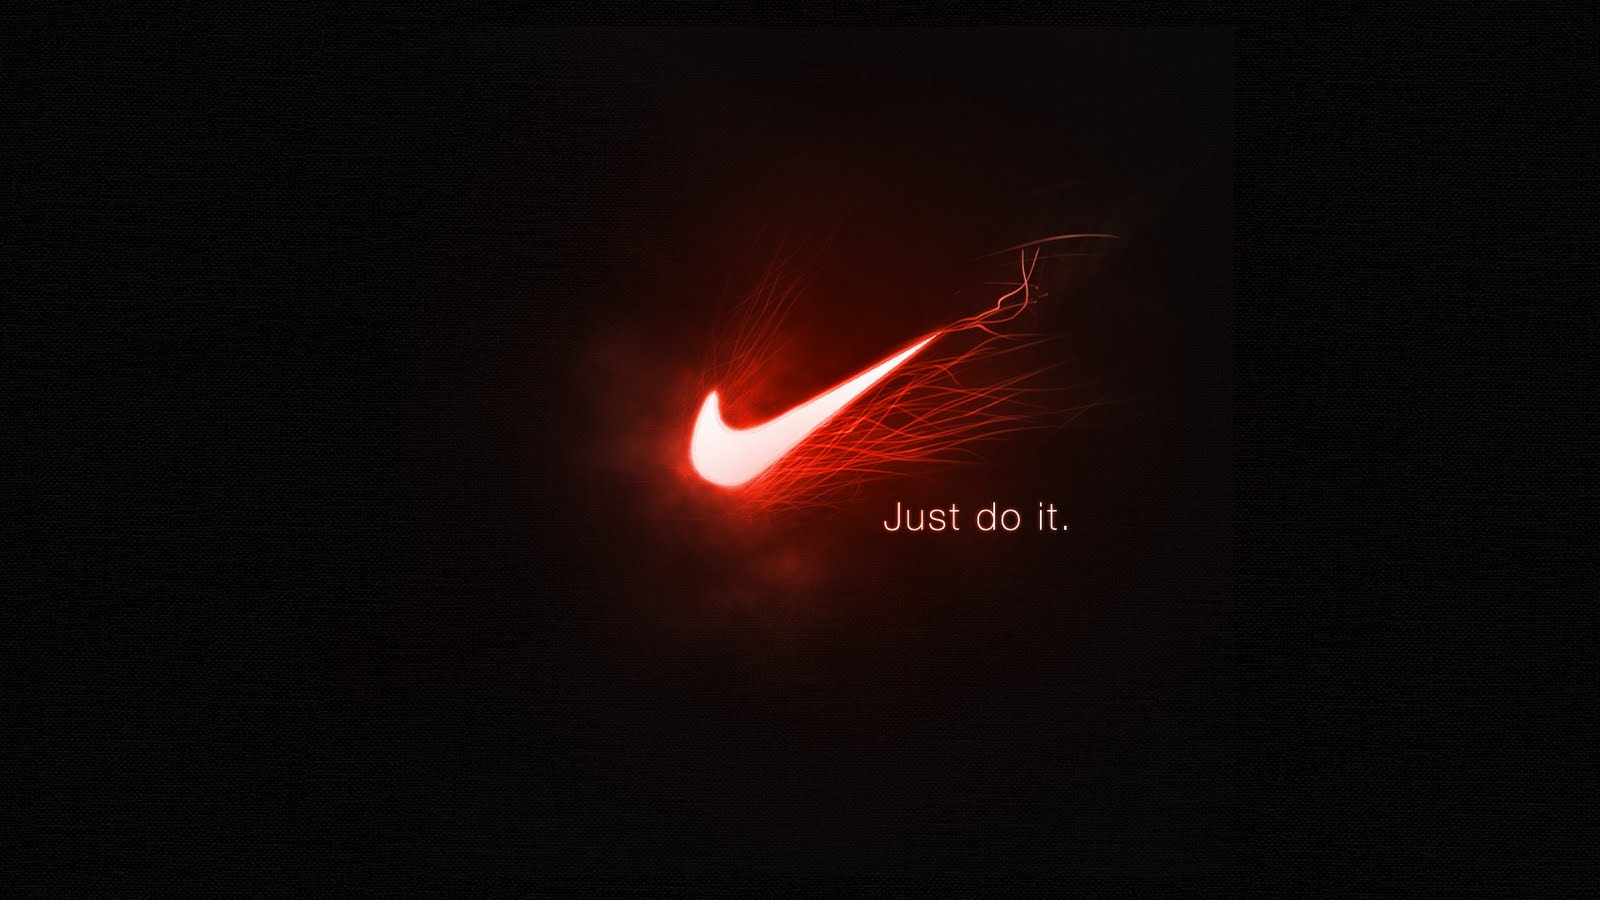 Nike just do it logo iphone wallpaper download roblox - Nike Football Wallpaper 9153 Hd Wallpapers In Football Imagesci Com